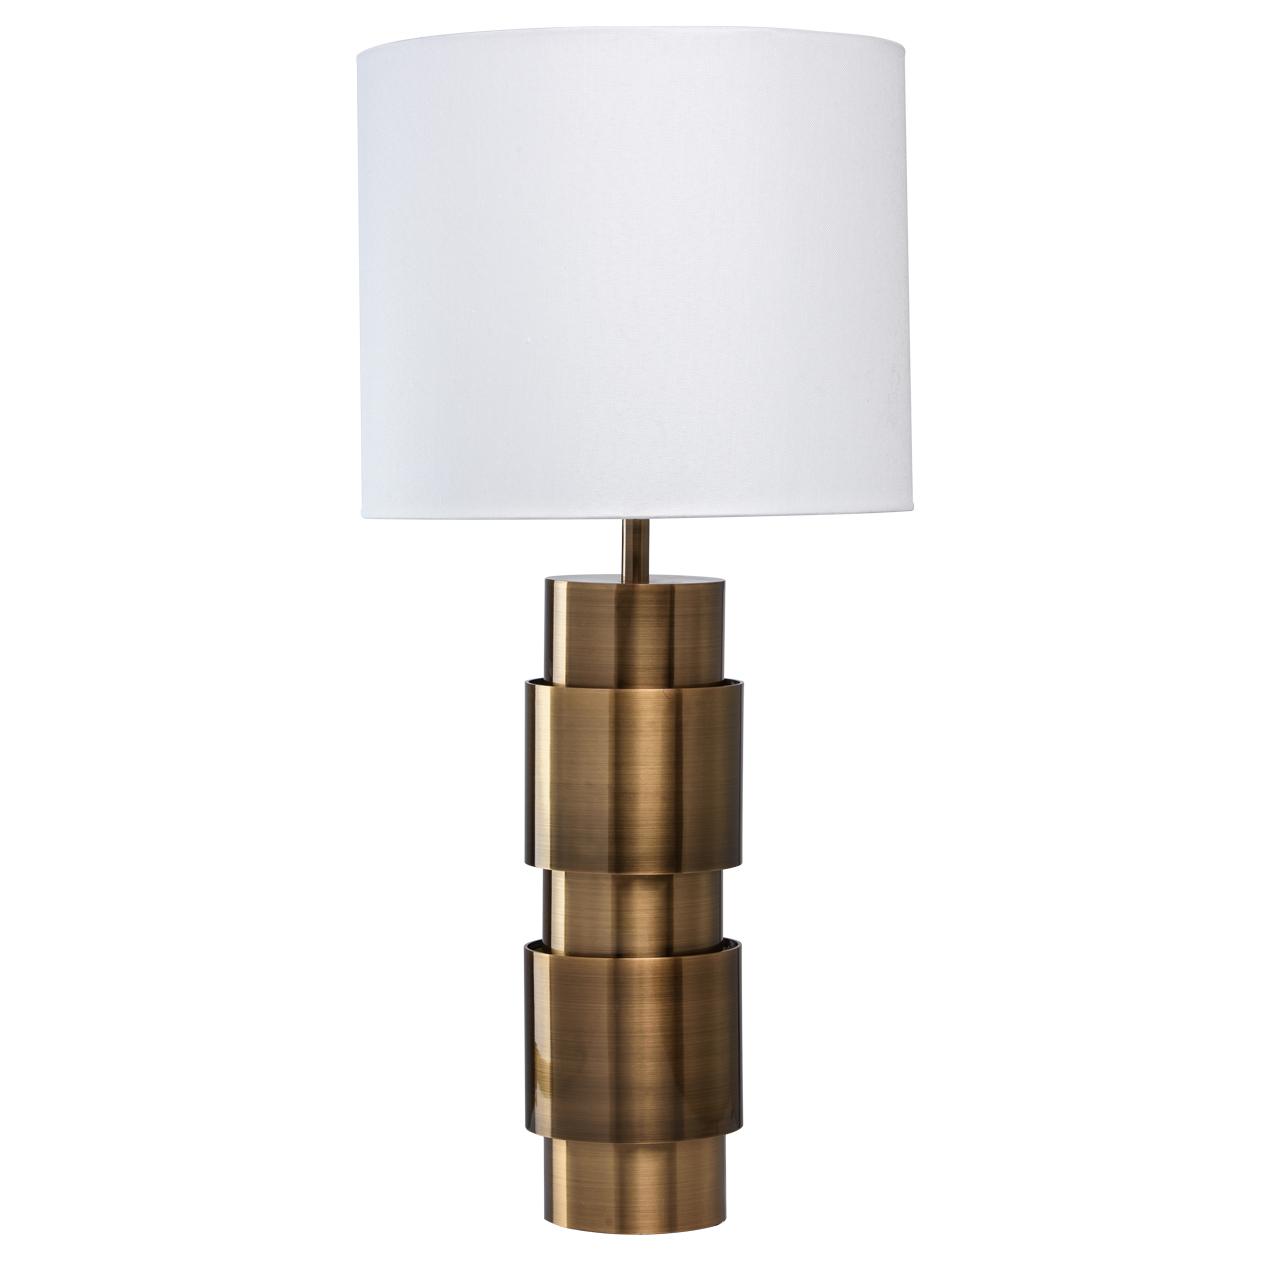 Лампа настольная Regenbogen 498033401 1/60w e27 220 лампа настольная navigator 61 637 ndf d026 60w b e27 синий